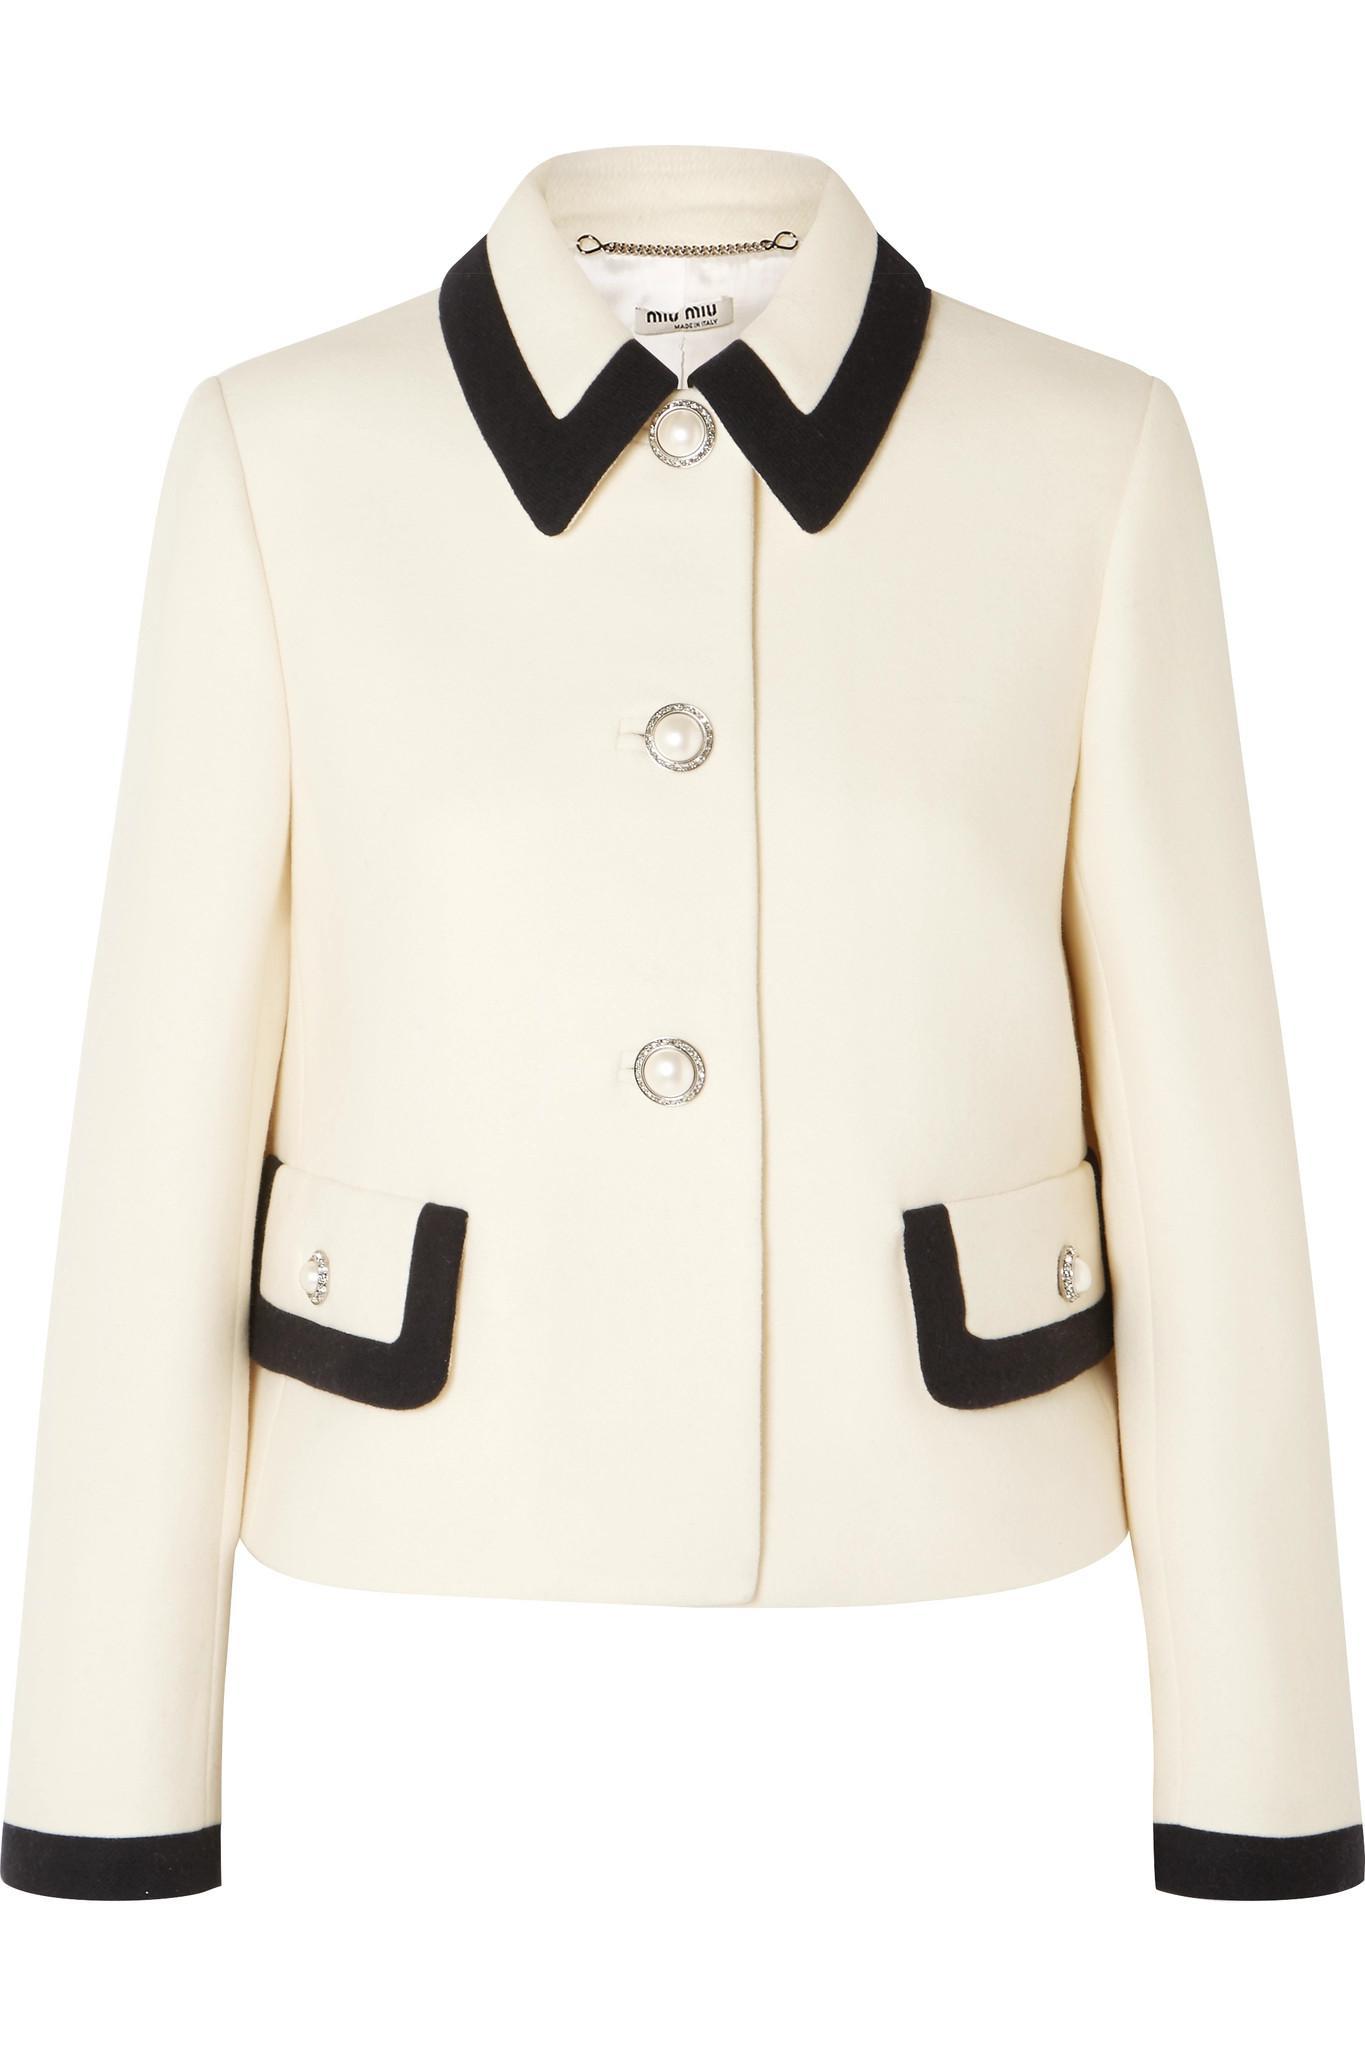 64883649841 Lyst - Miu Miu Faux Pearl-embellished Wool-crepe Jacket in White